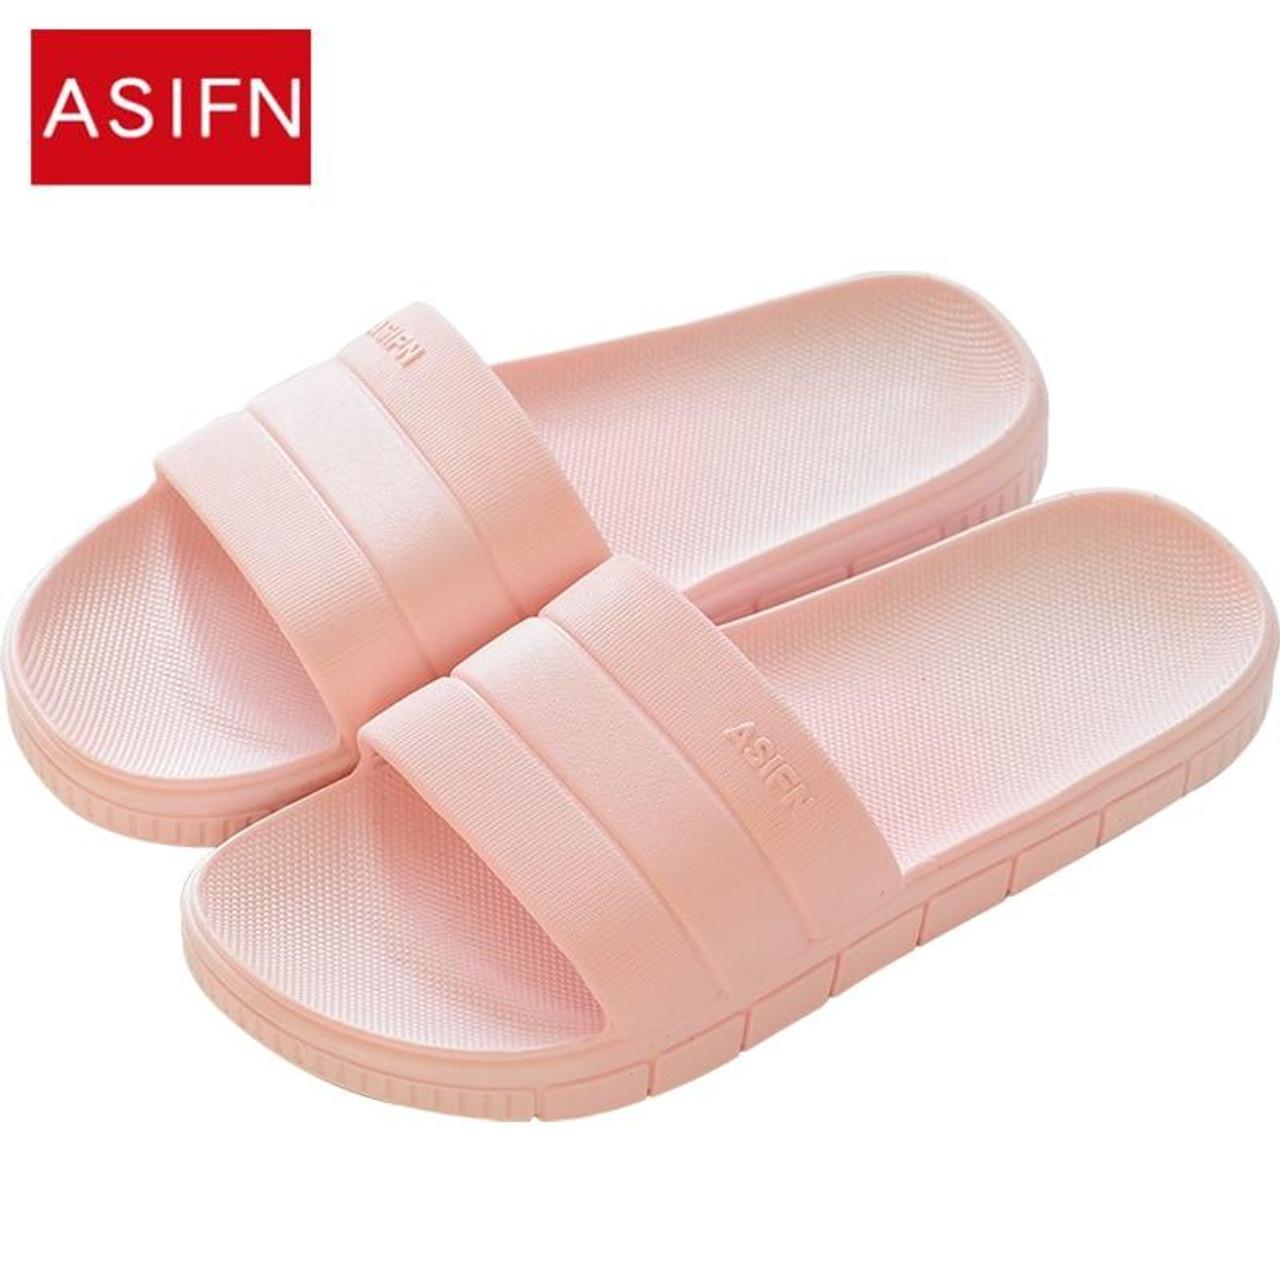 Men Women Summer Slippers Open Toe Sandals Soft Slip-on Home Casual Flat Shoes